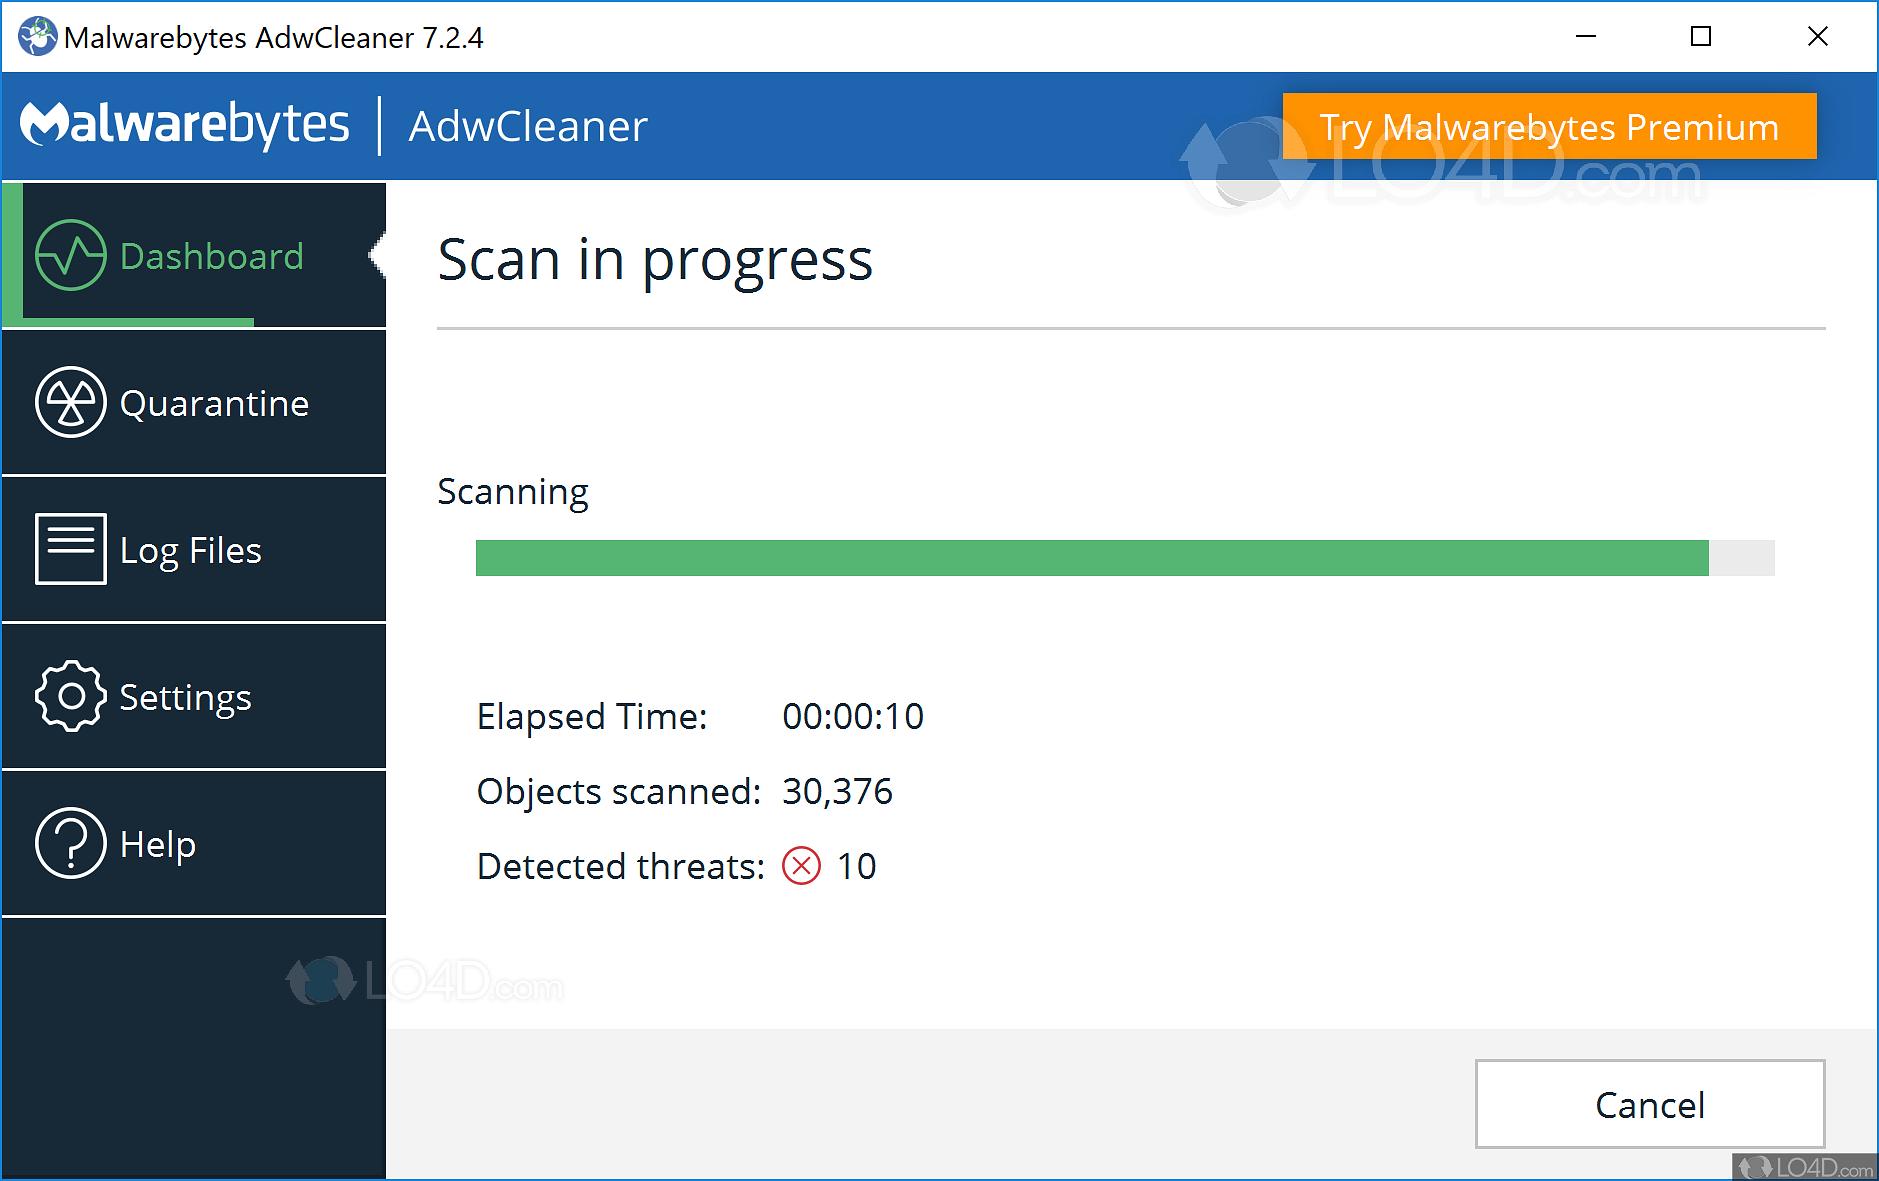 adwcleaner download for windows xp 32 bit